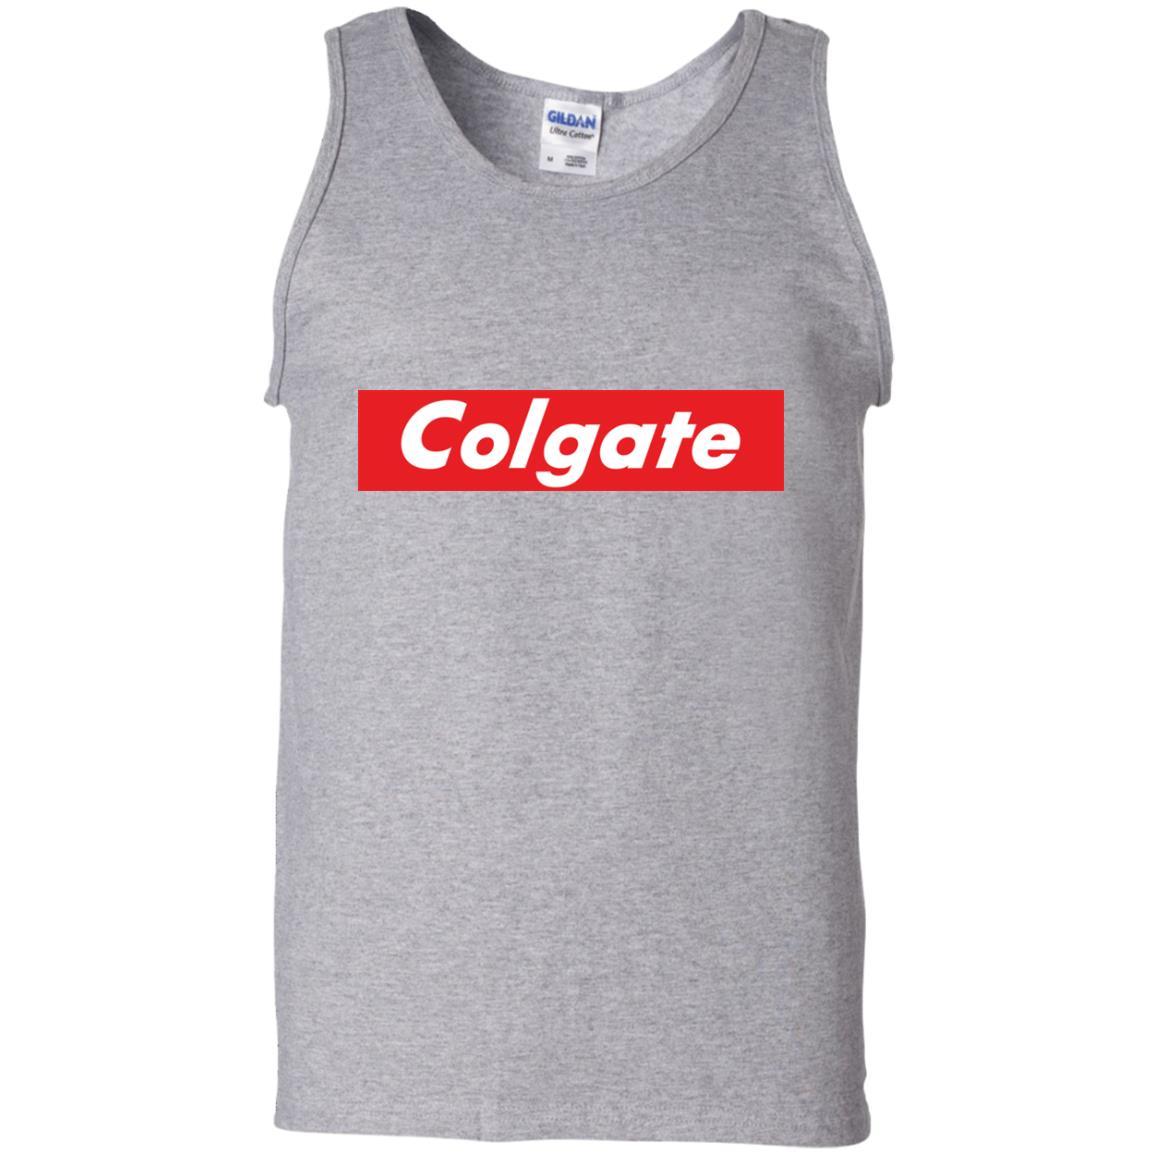 image 995px Supreme Colgate Shirt, Hoodies, Tank